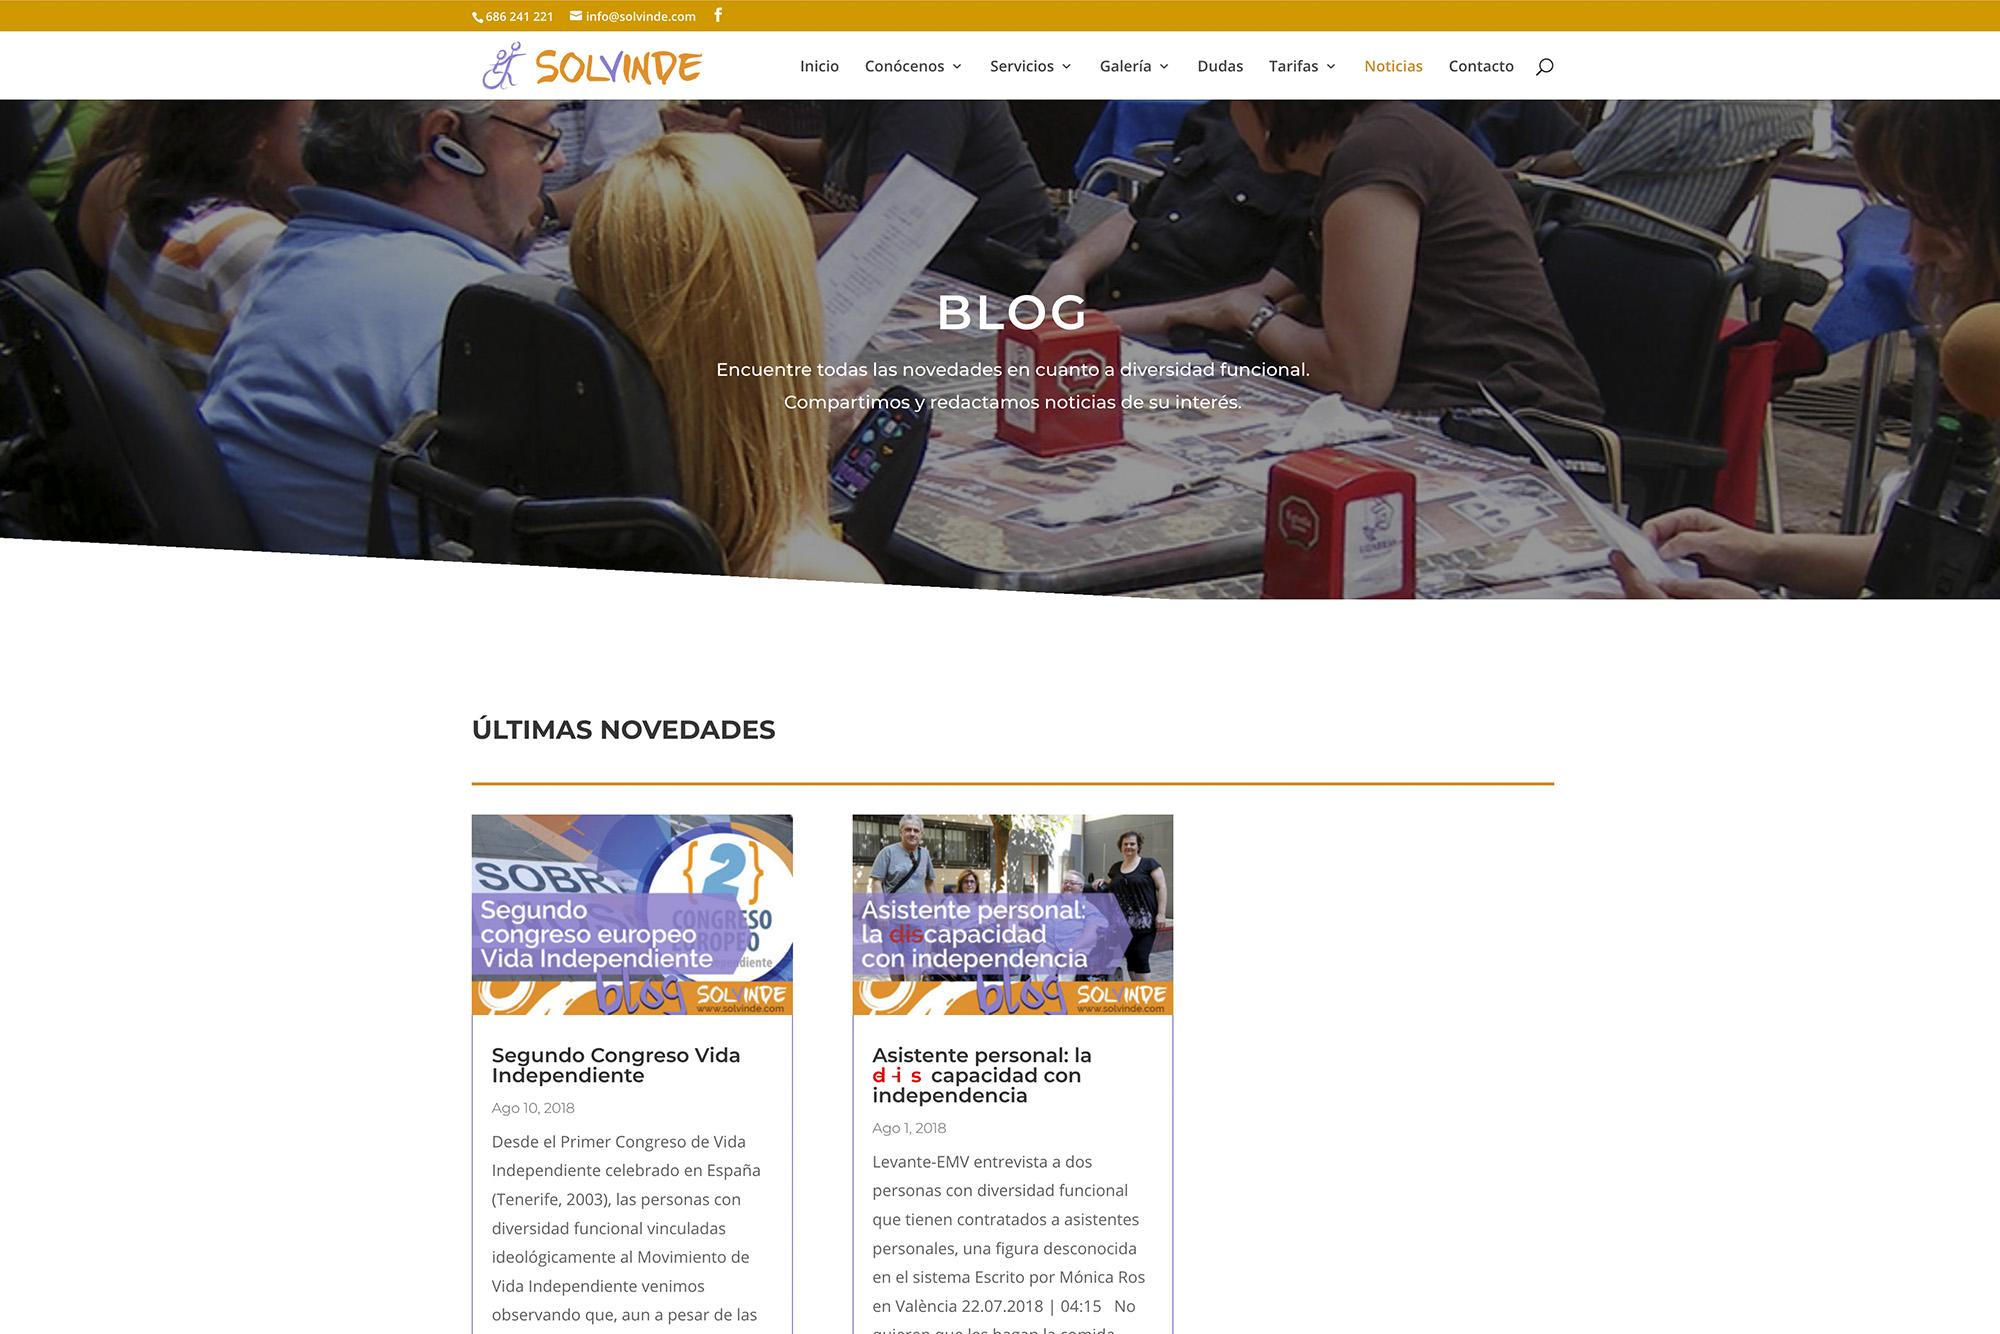 diseno-web-solvinde-beaesreal_0003_Captura de pantalla 2018-10-15 a las 12.17.14